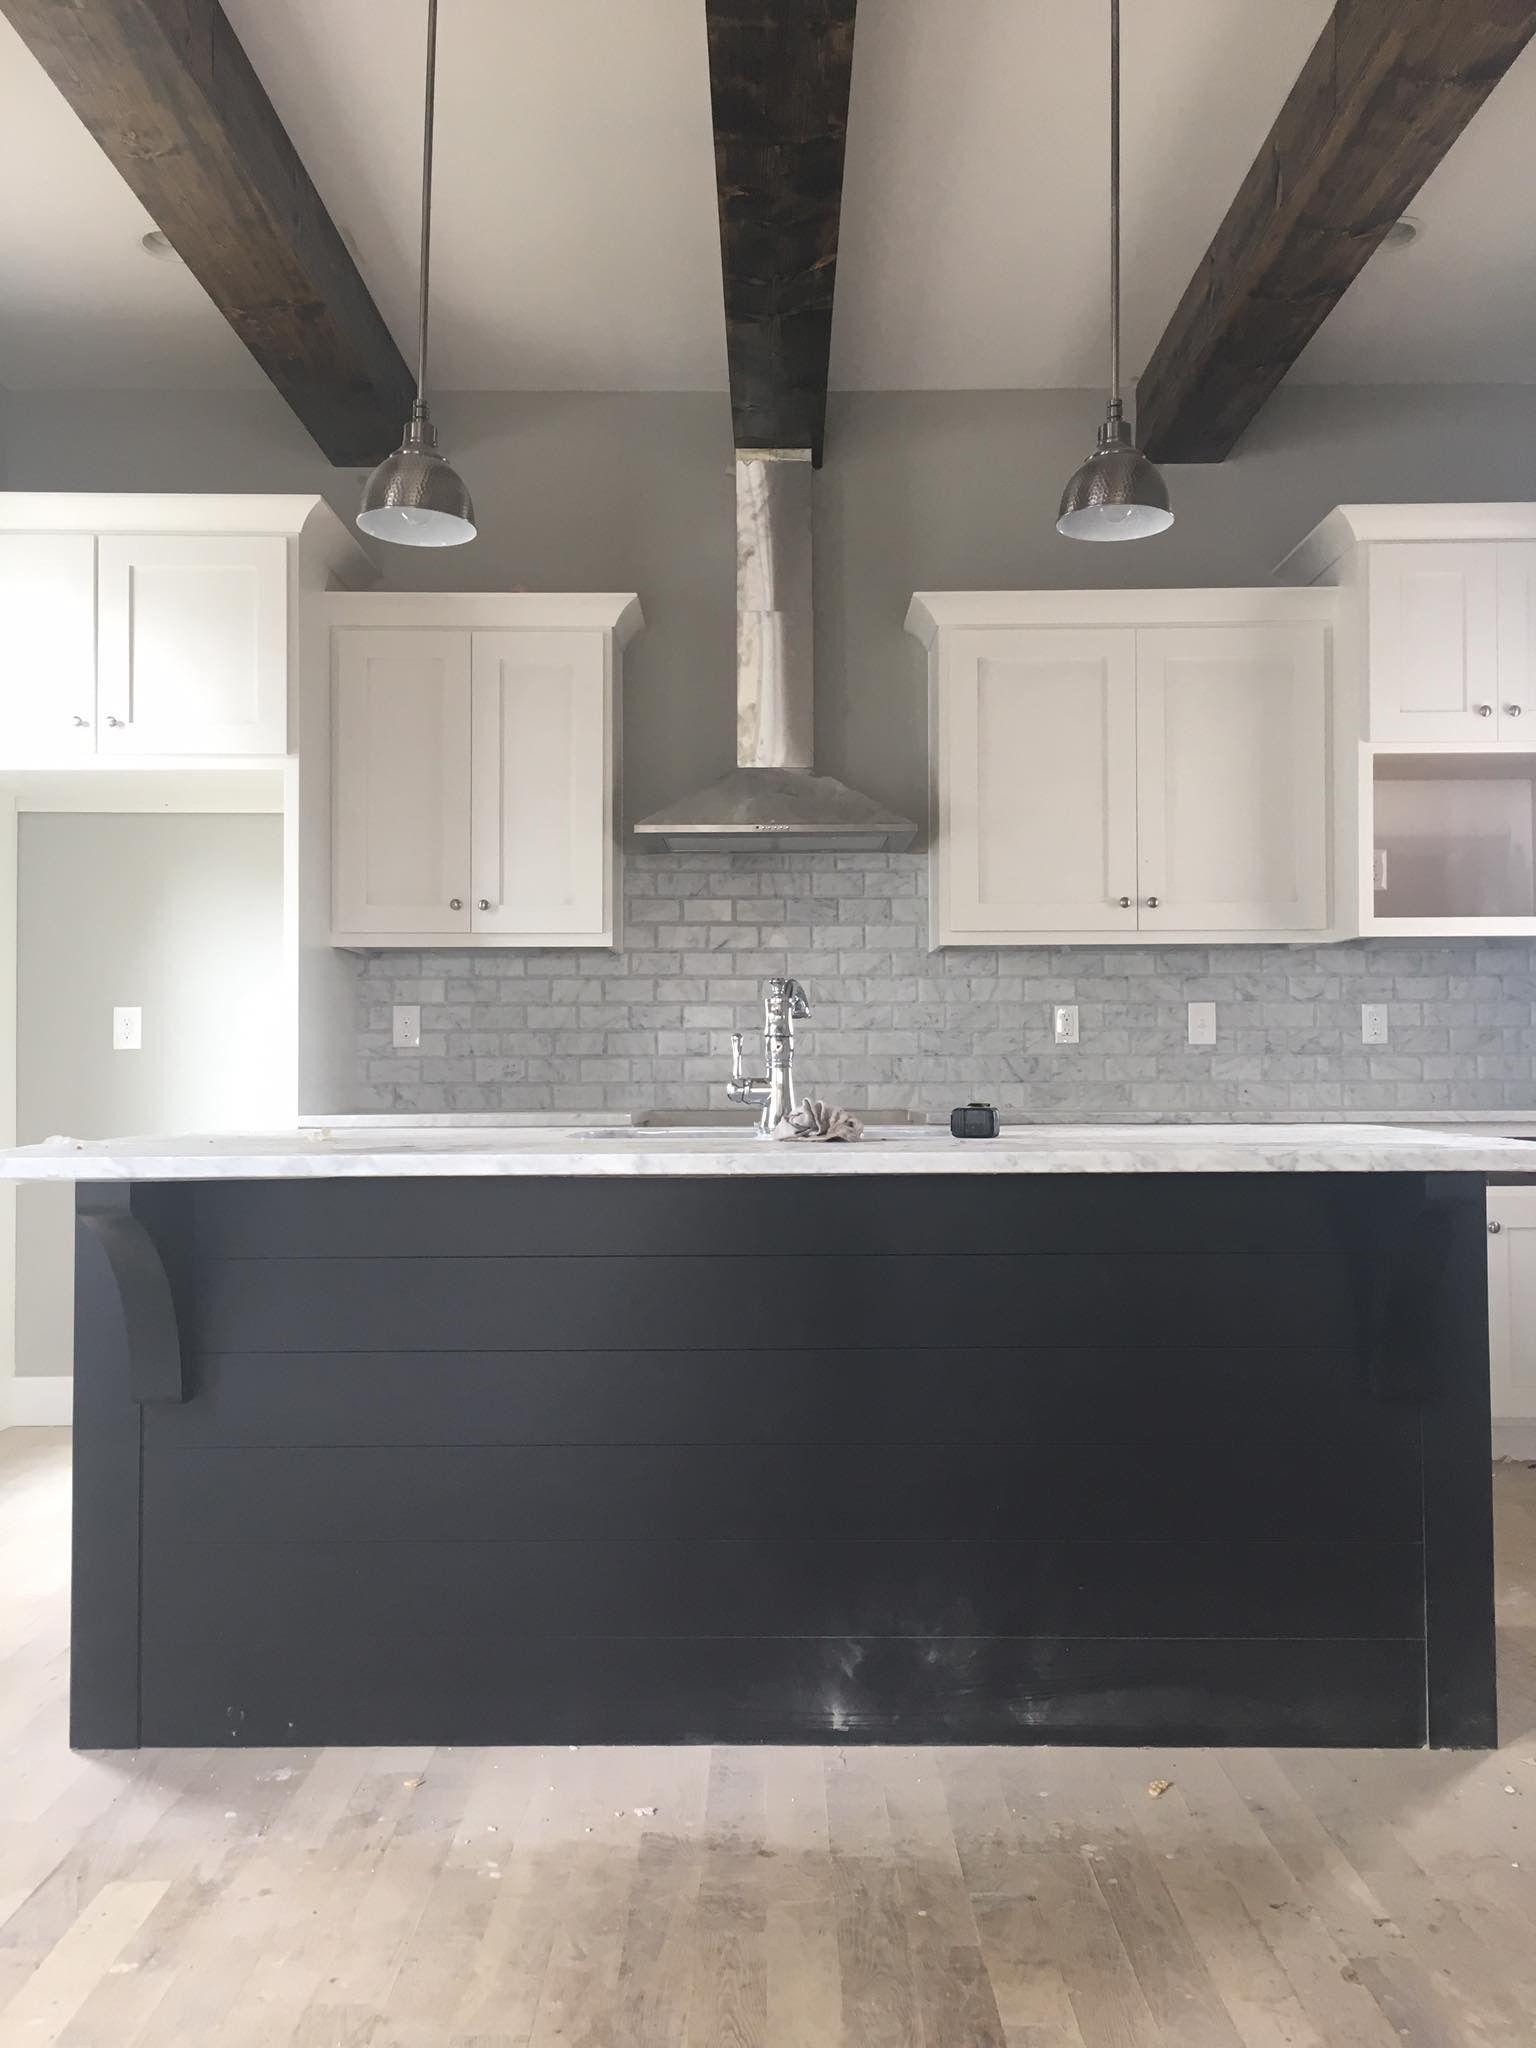 East Nashville Classic Modern Craftsman Kitchen. Wood Beams, Marble  Backsplash, White Cabinets With